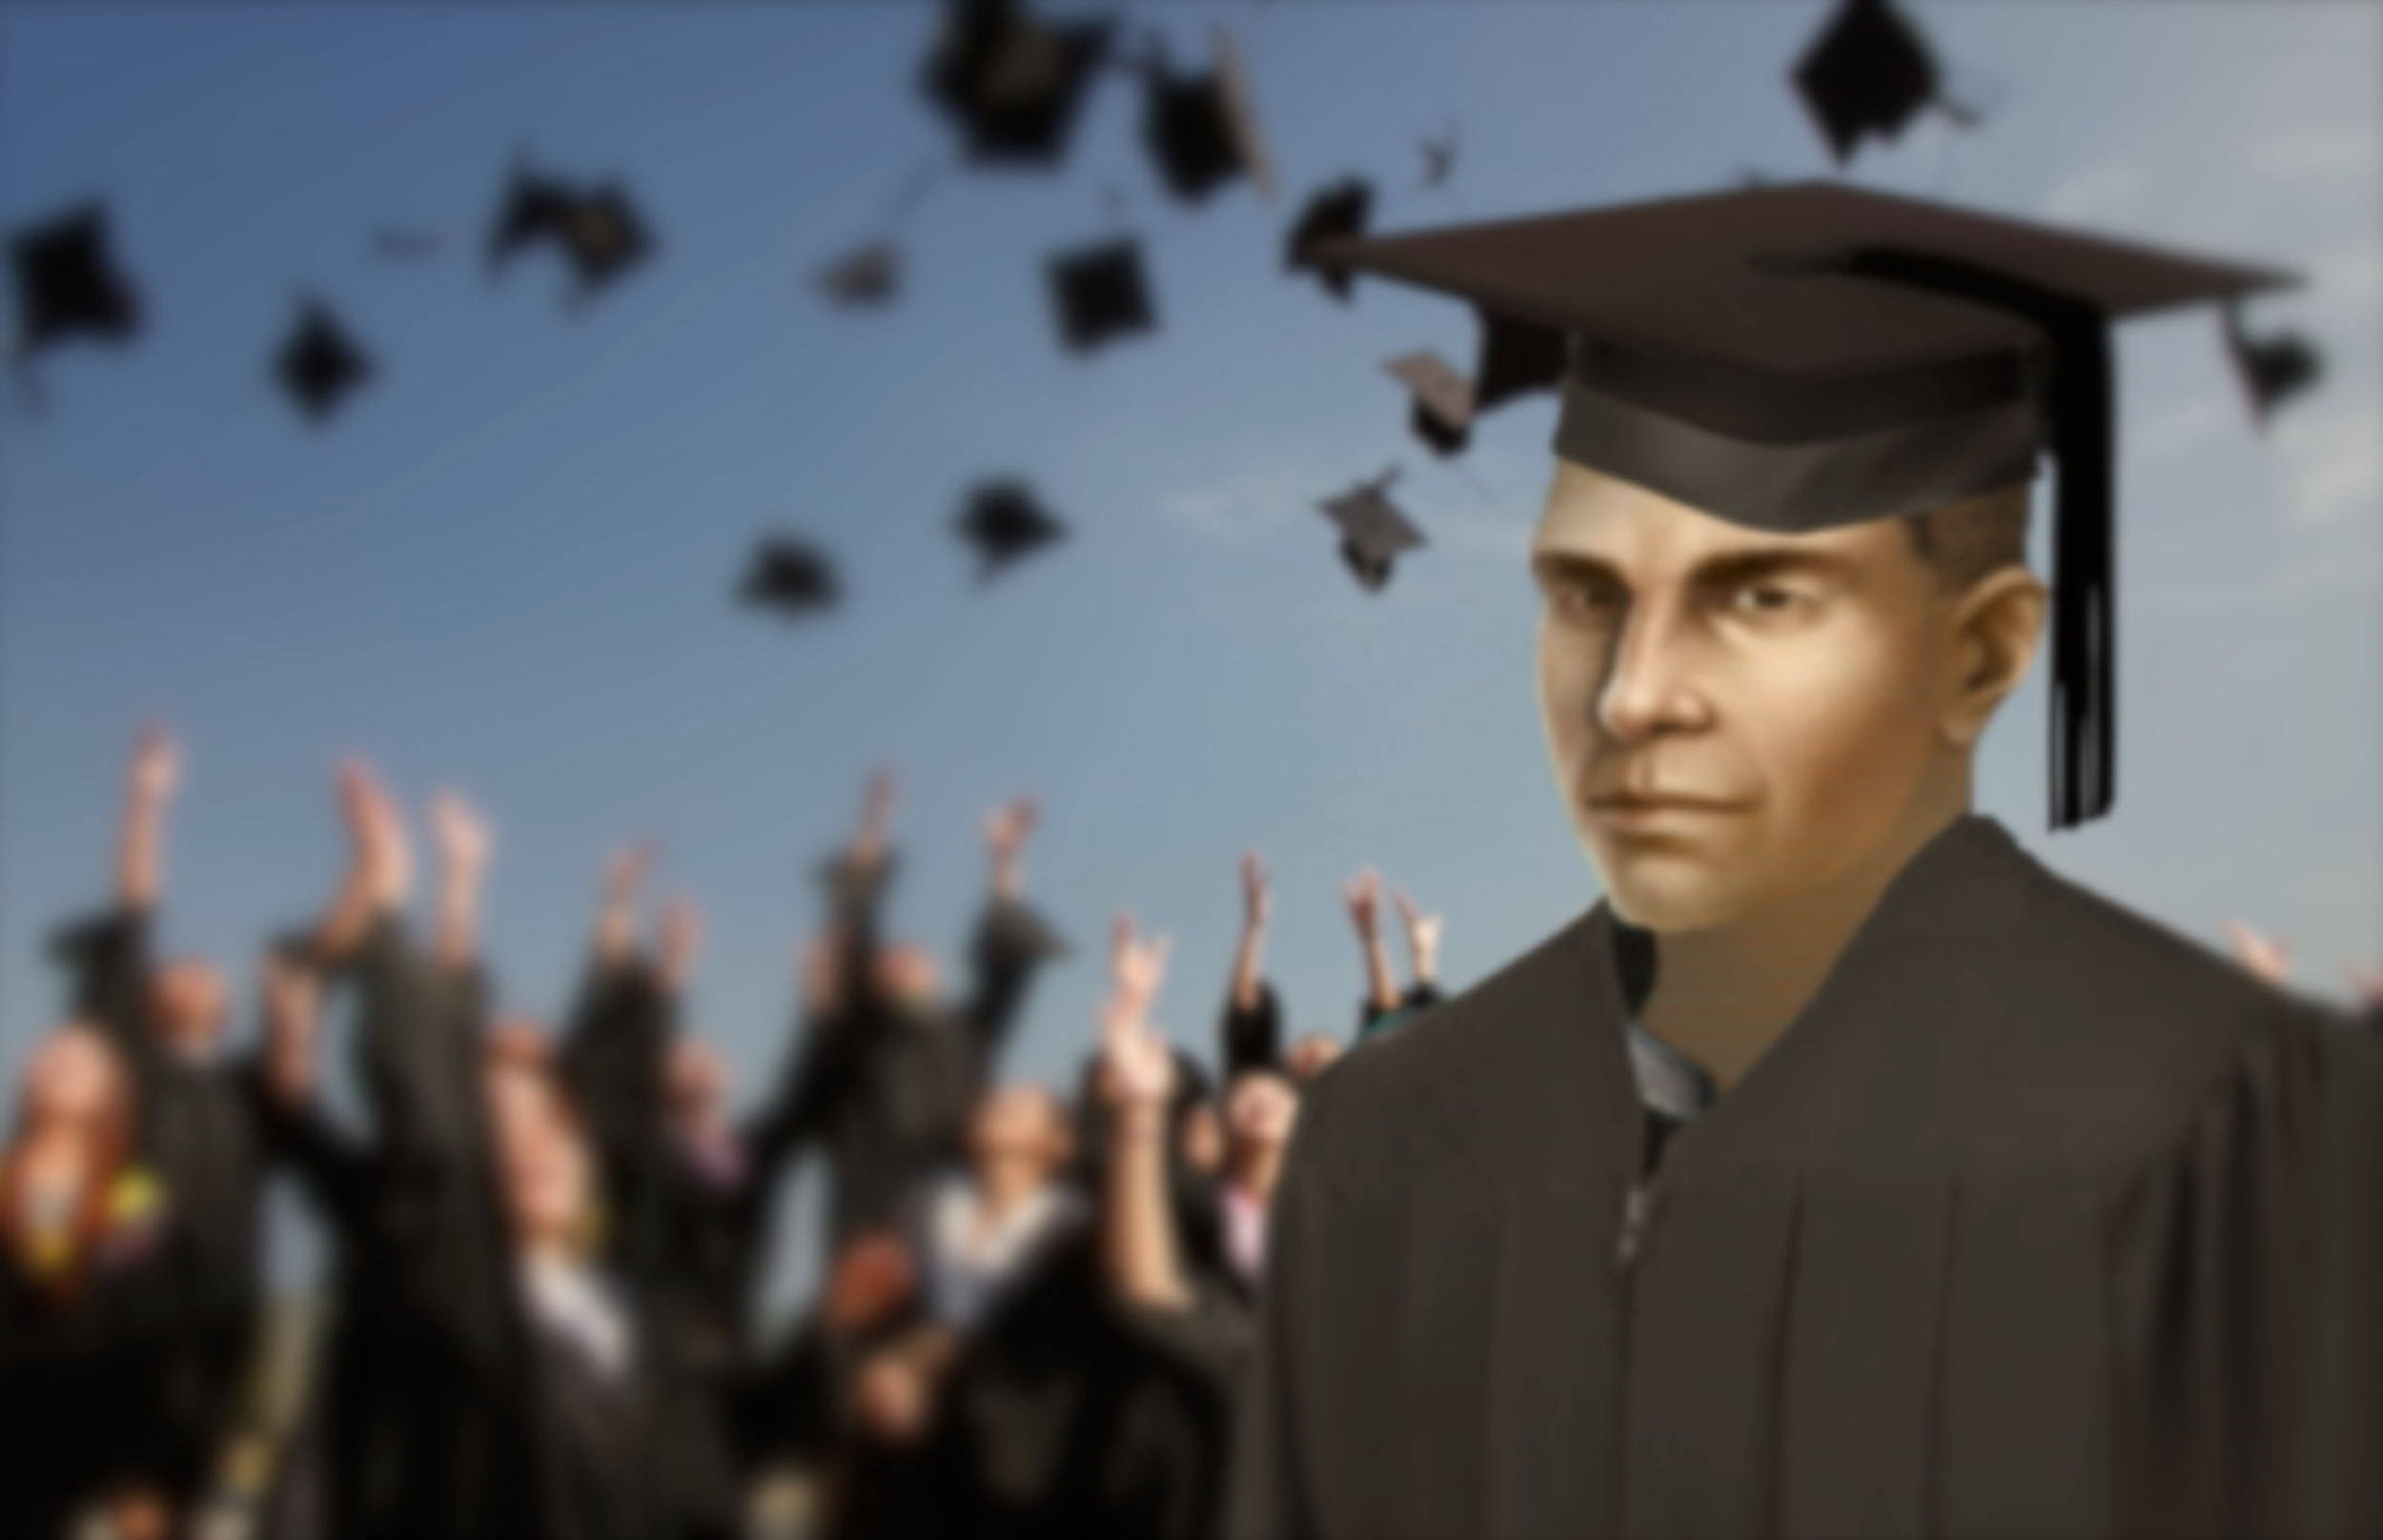 Image: Paul Bork graduates from Ulm Fleet Academy.